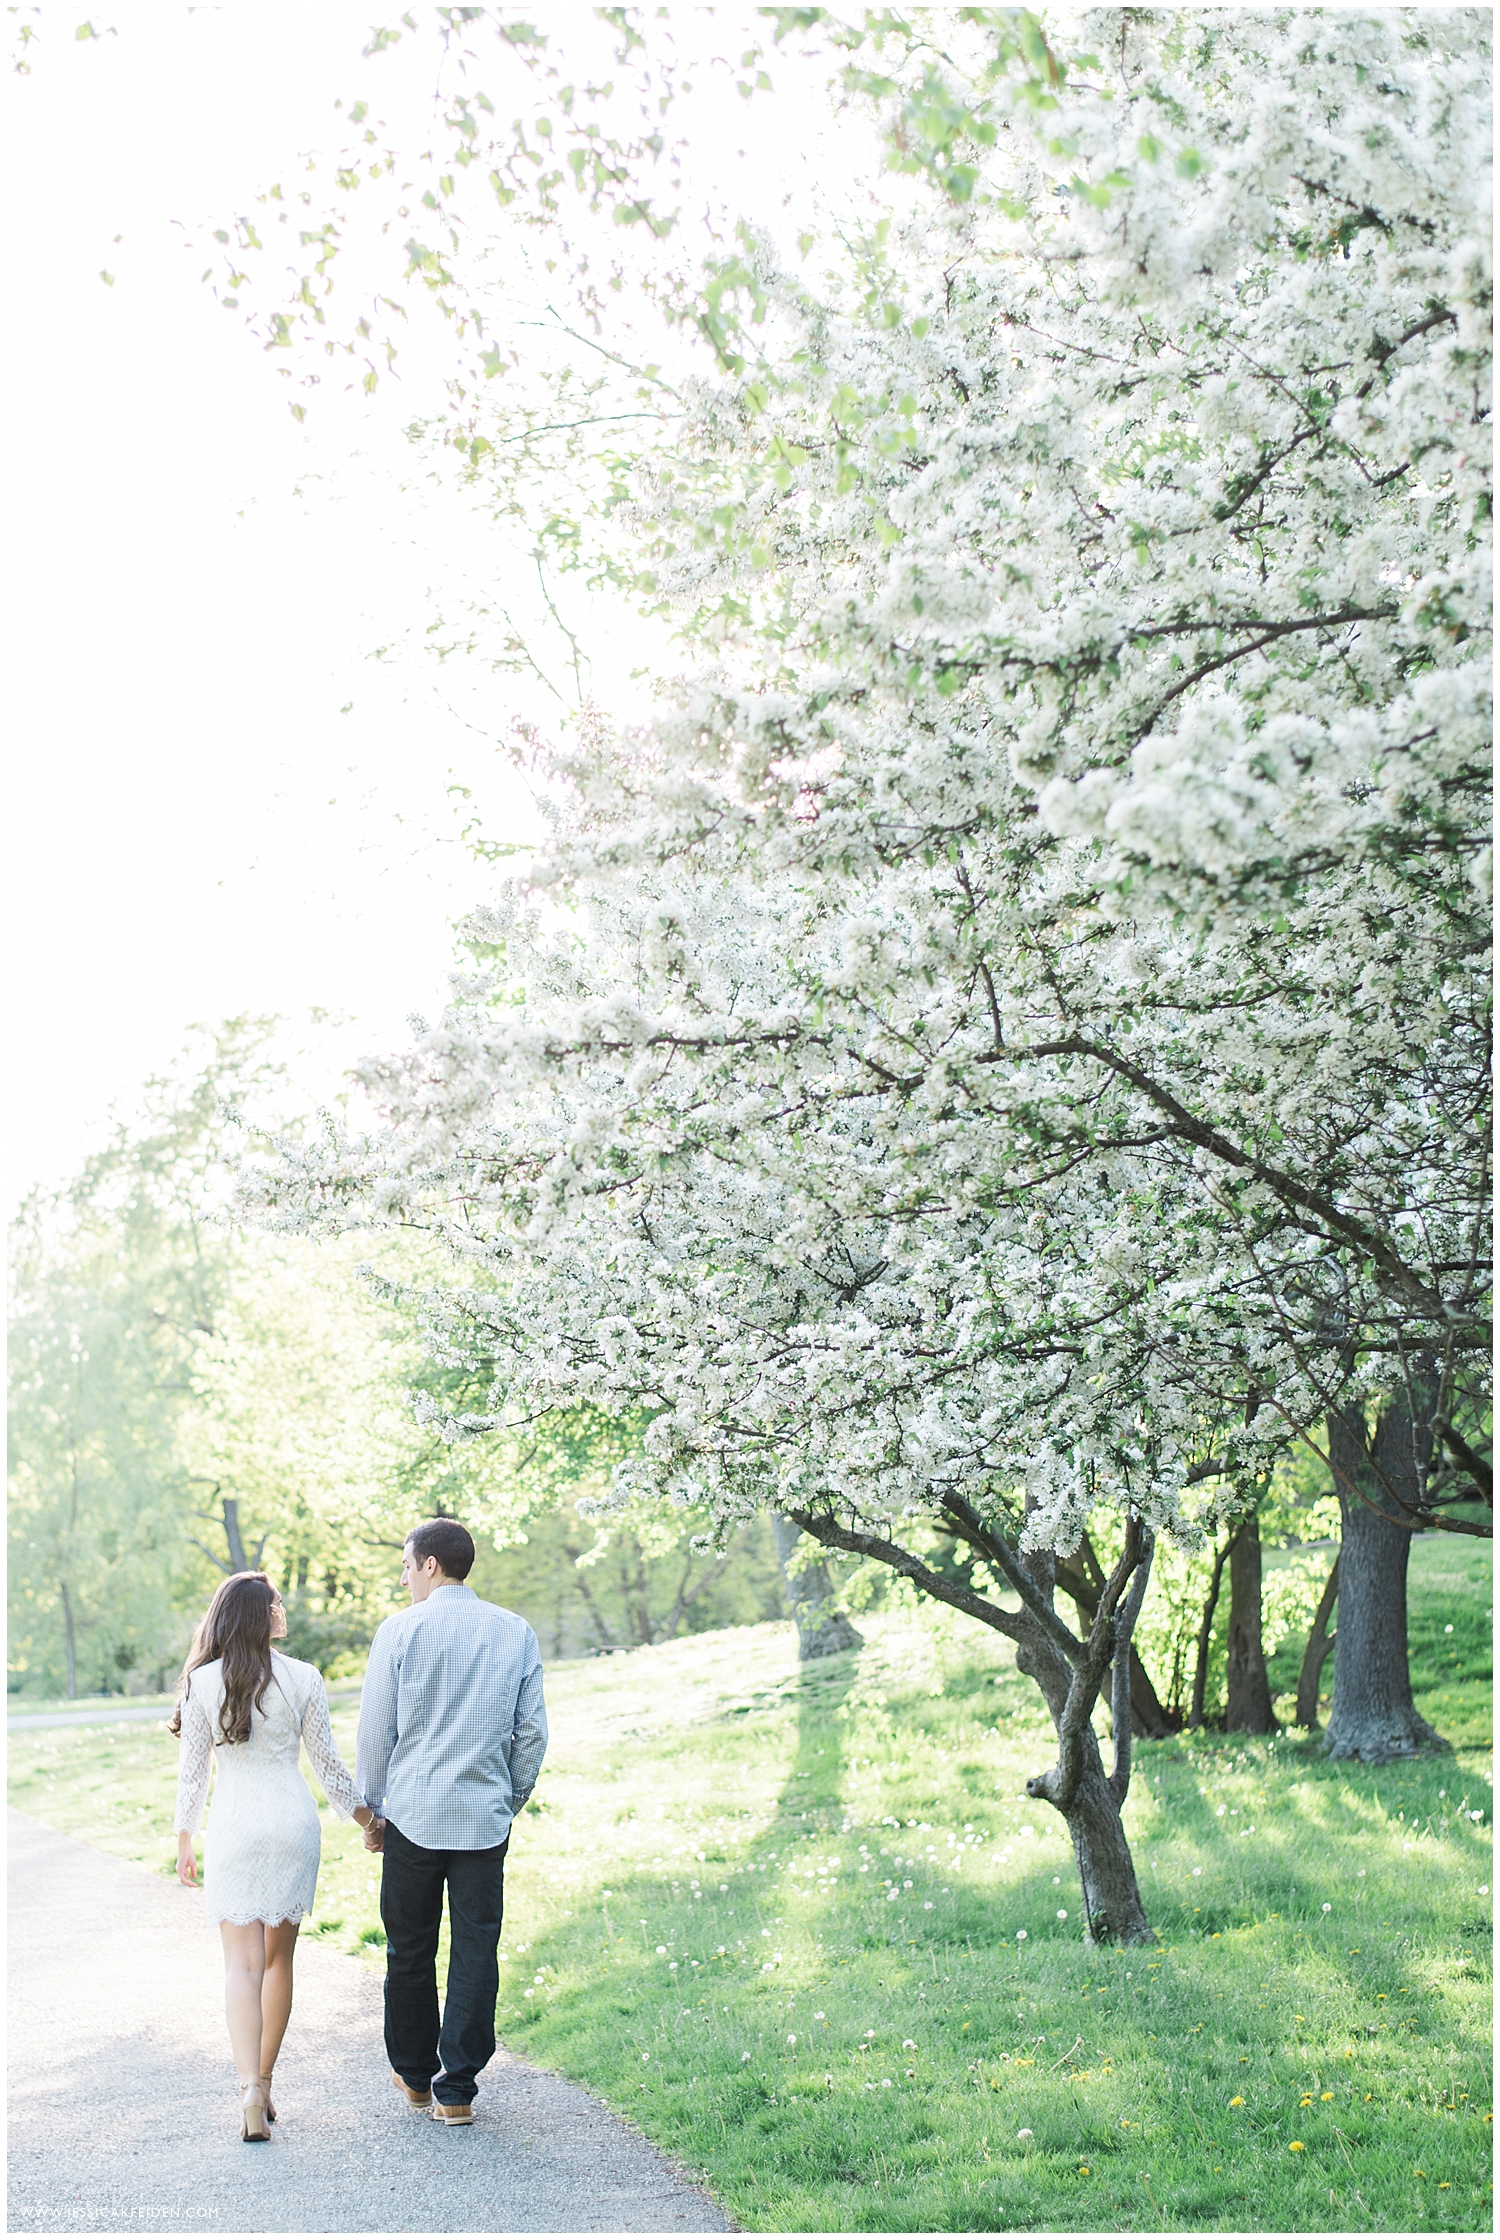 Jessica K Feiden Photography_Larz Anderson Park Engagement Session Photographer_0016.jpg